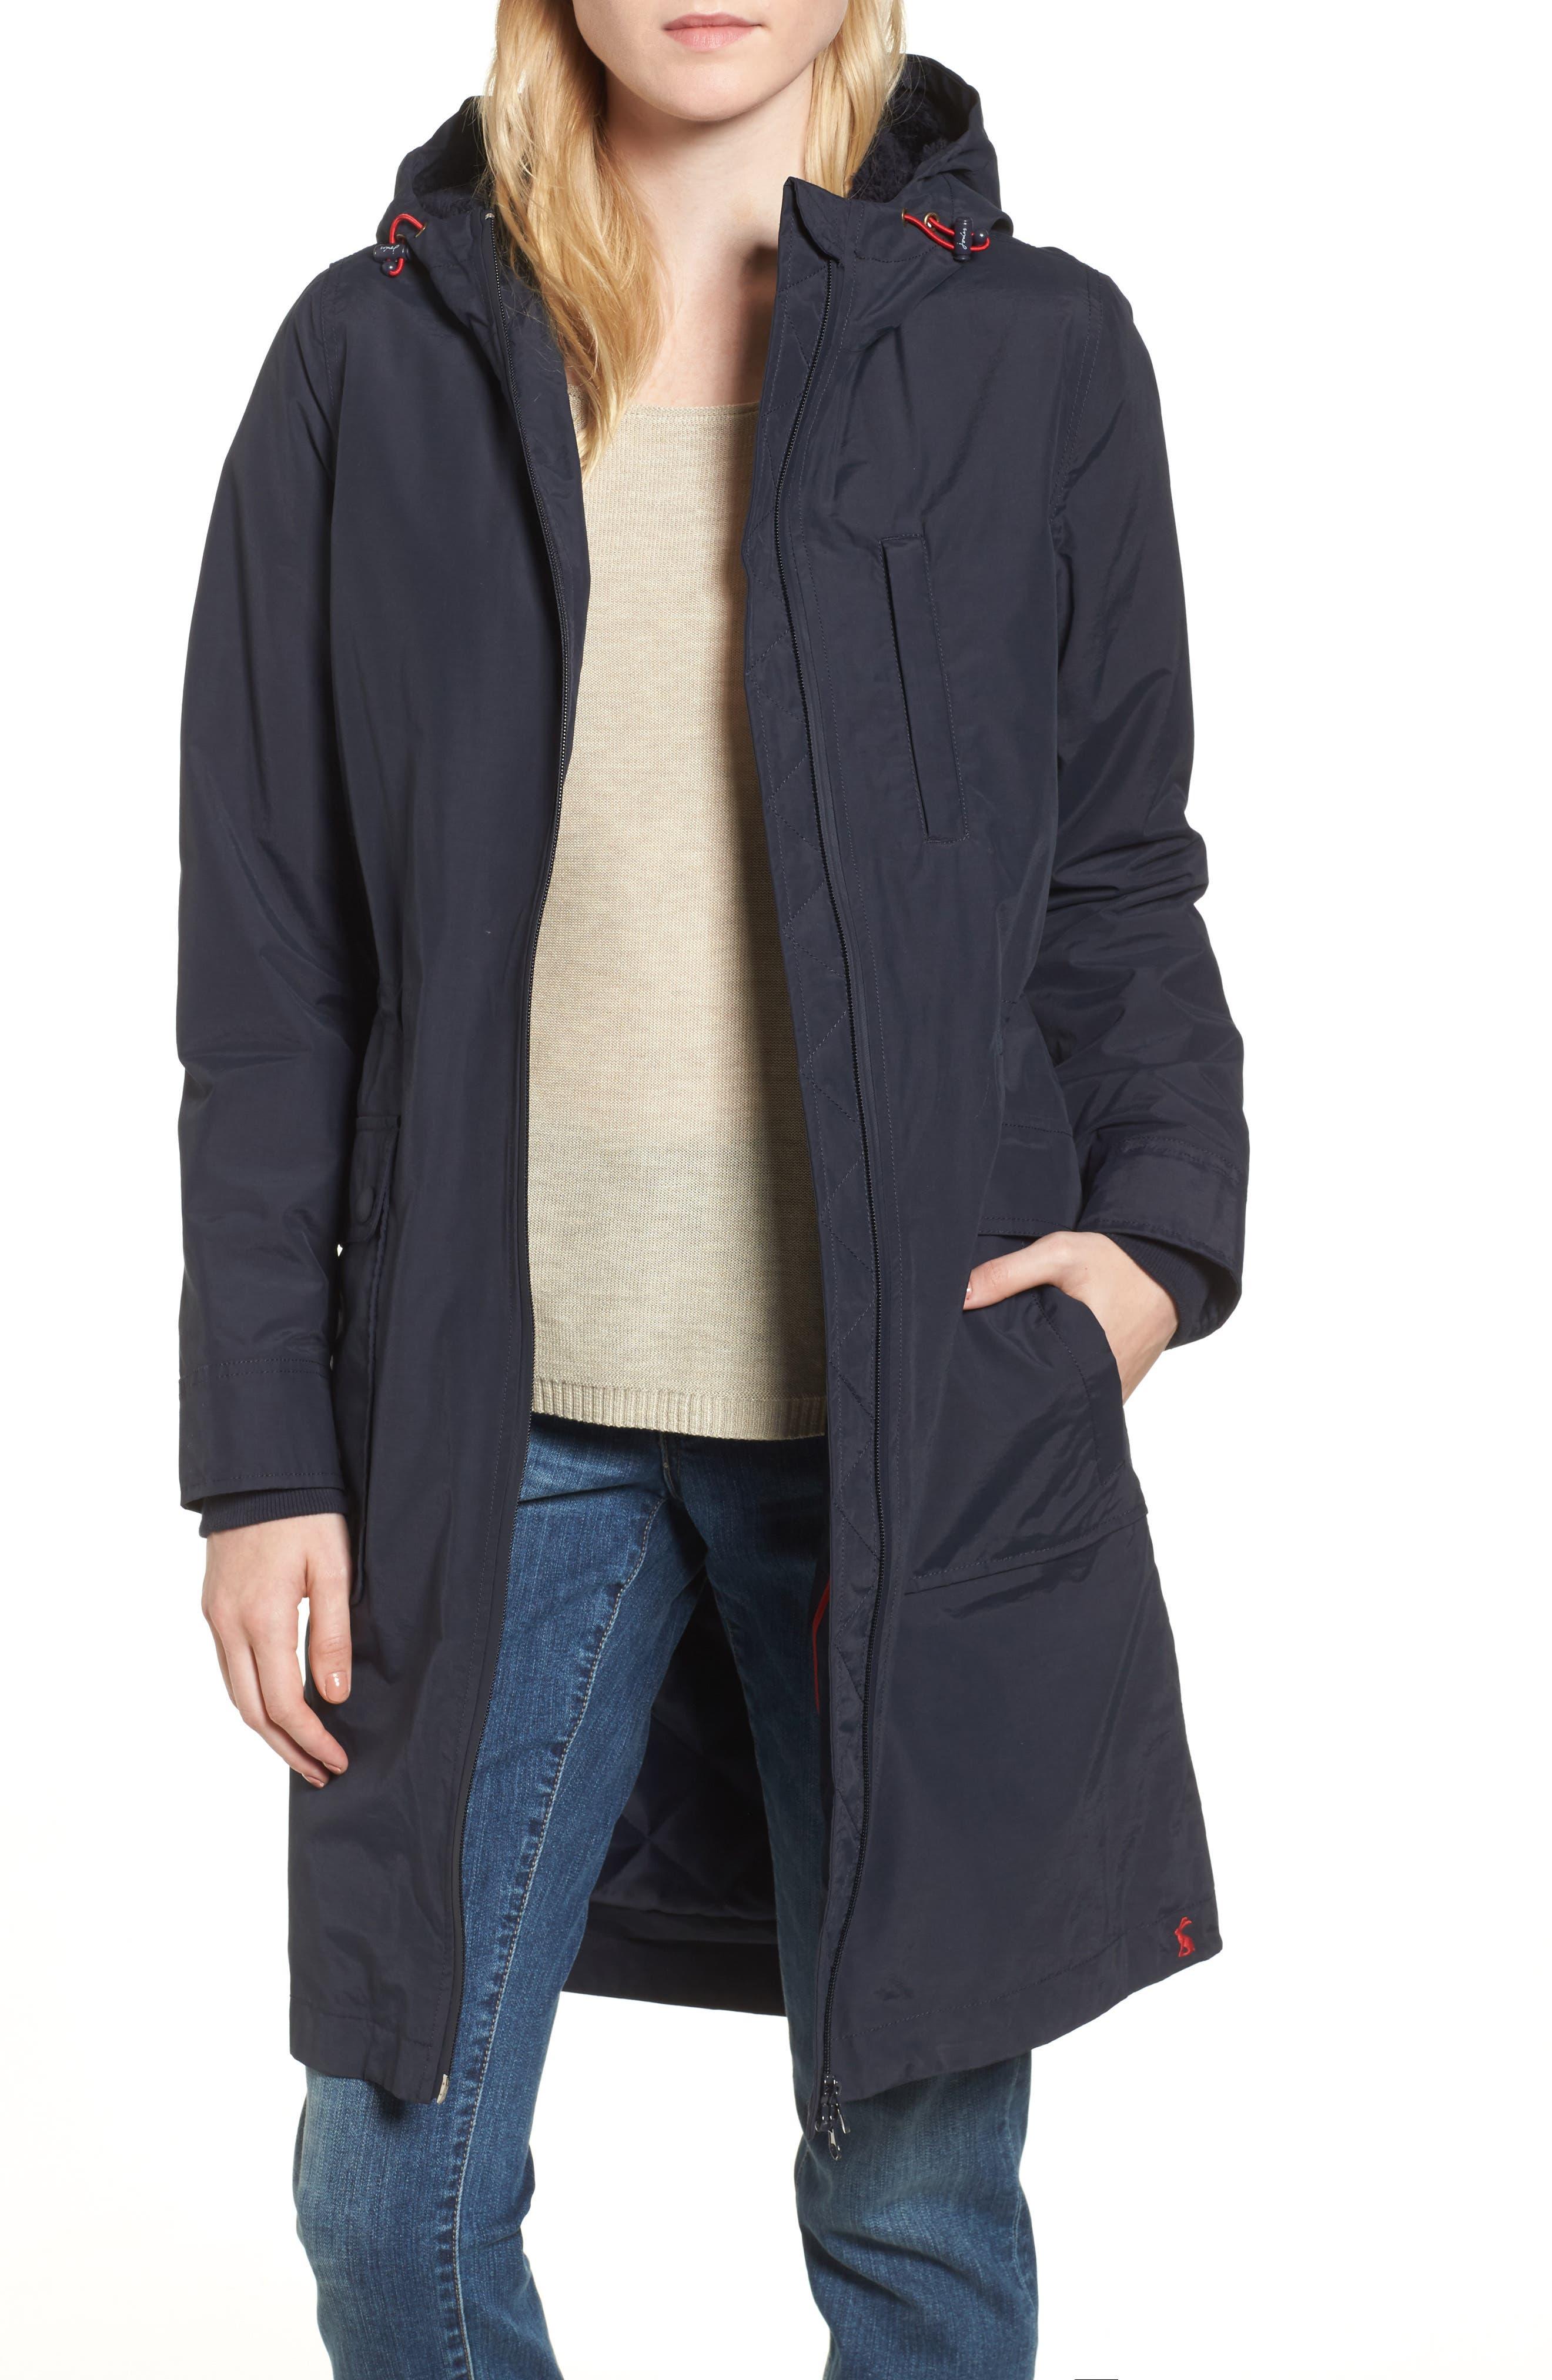 Joules Hooded Fleece Lined Raincoat